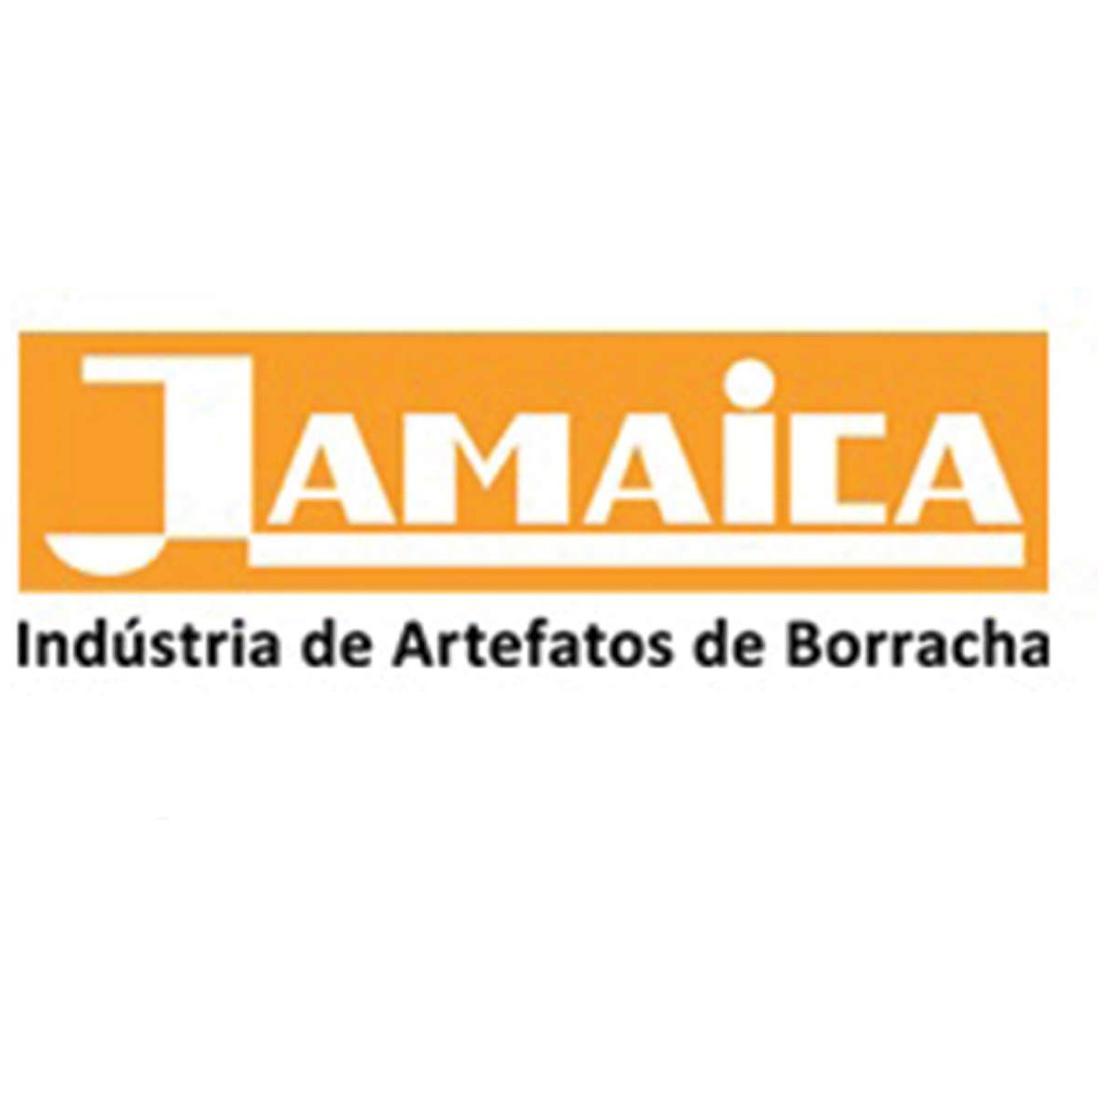 Jamaica Mangueiras